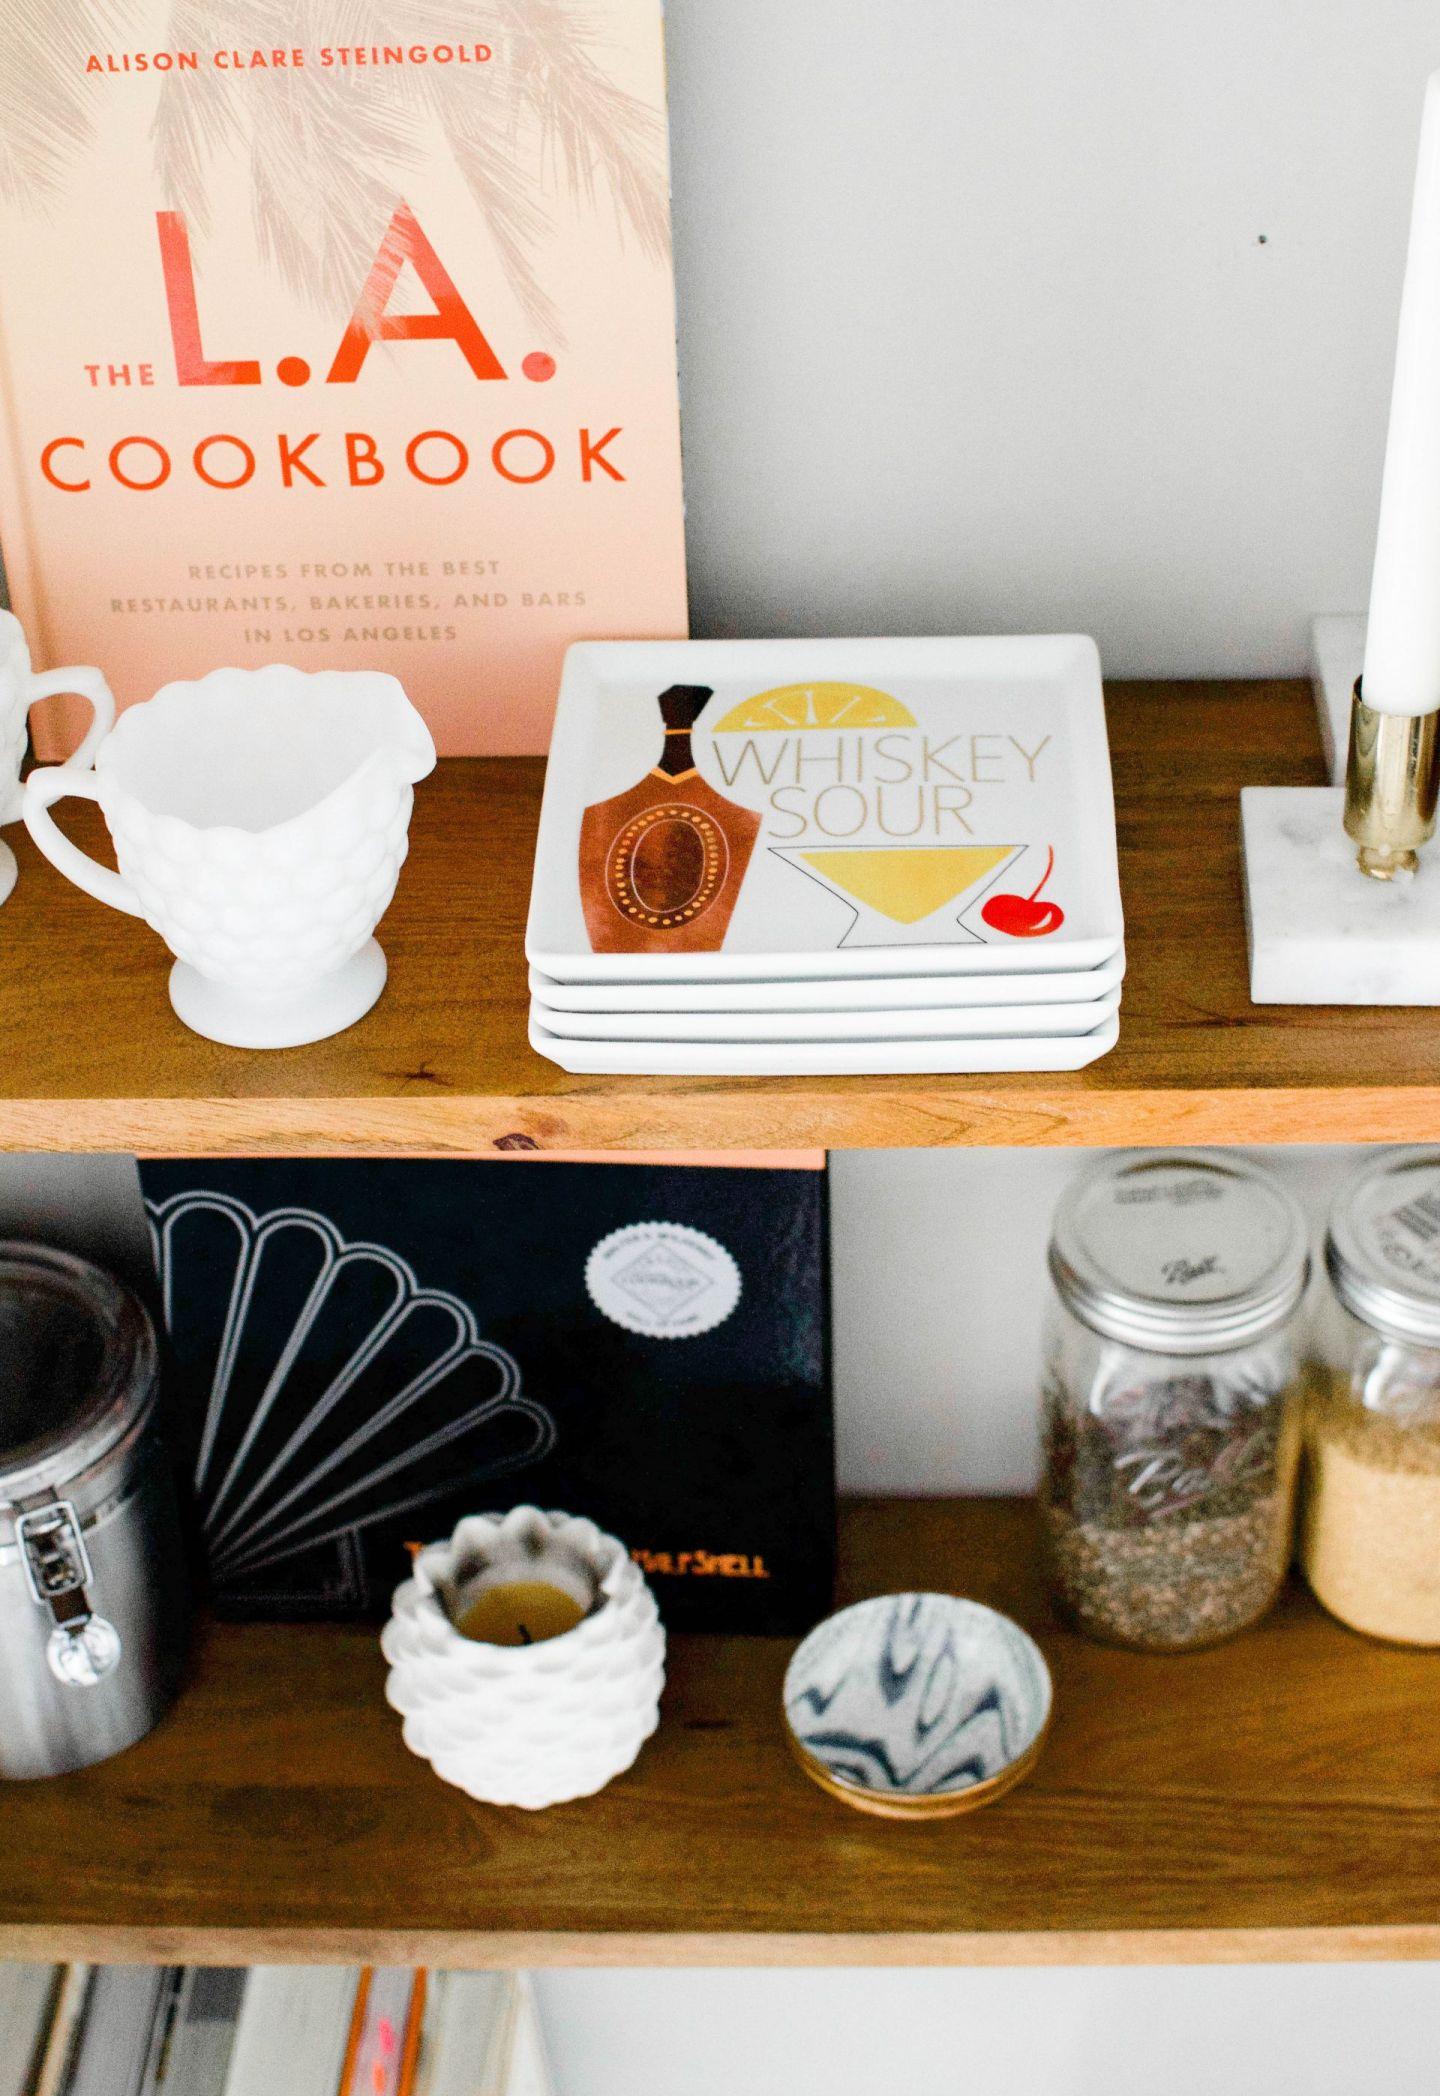 west elm linear wood interchangeable shelves - west elm floating shelves - kitchen open shelving - small space kitchen storage